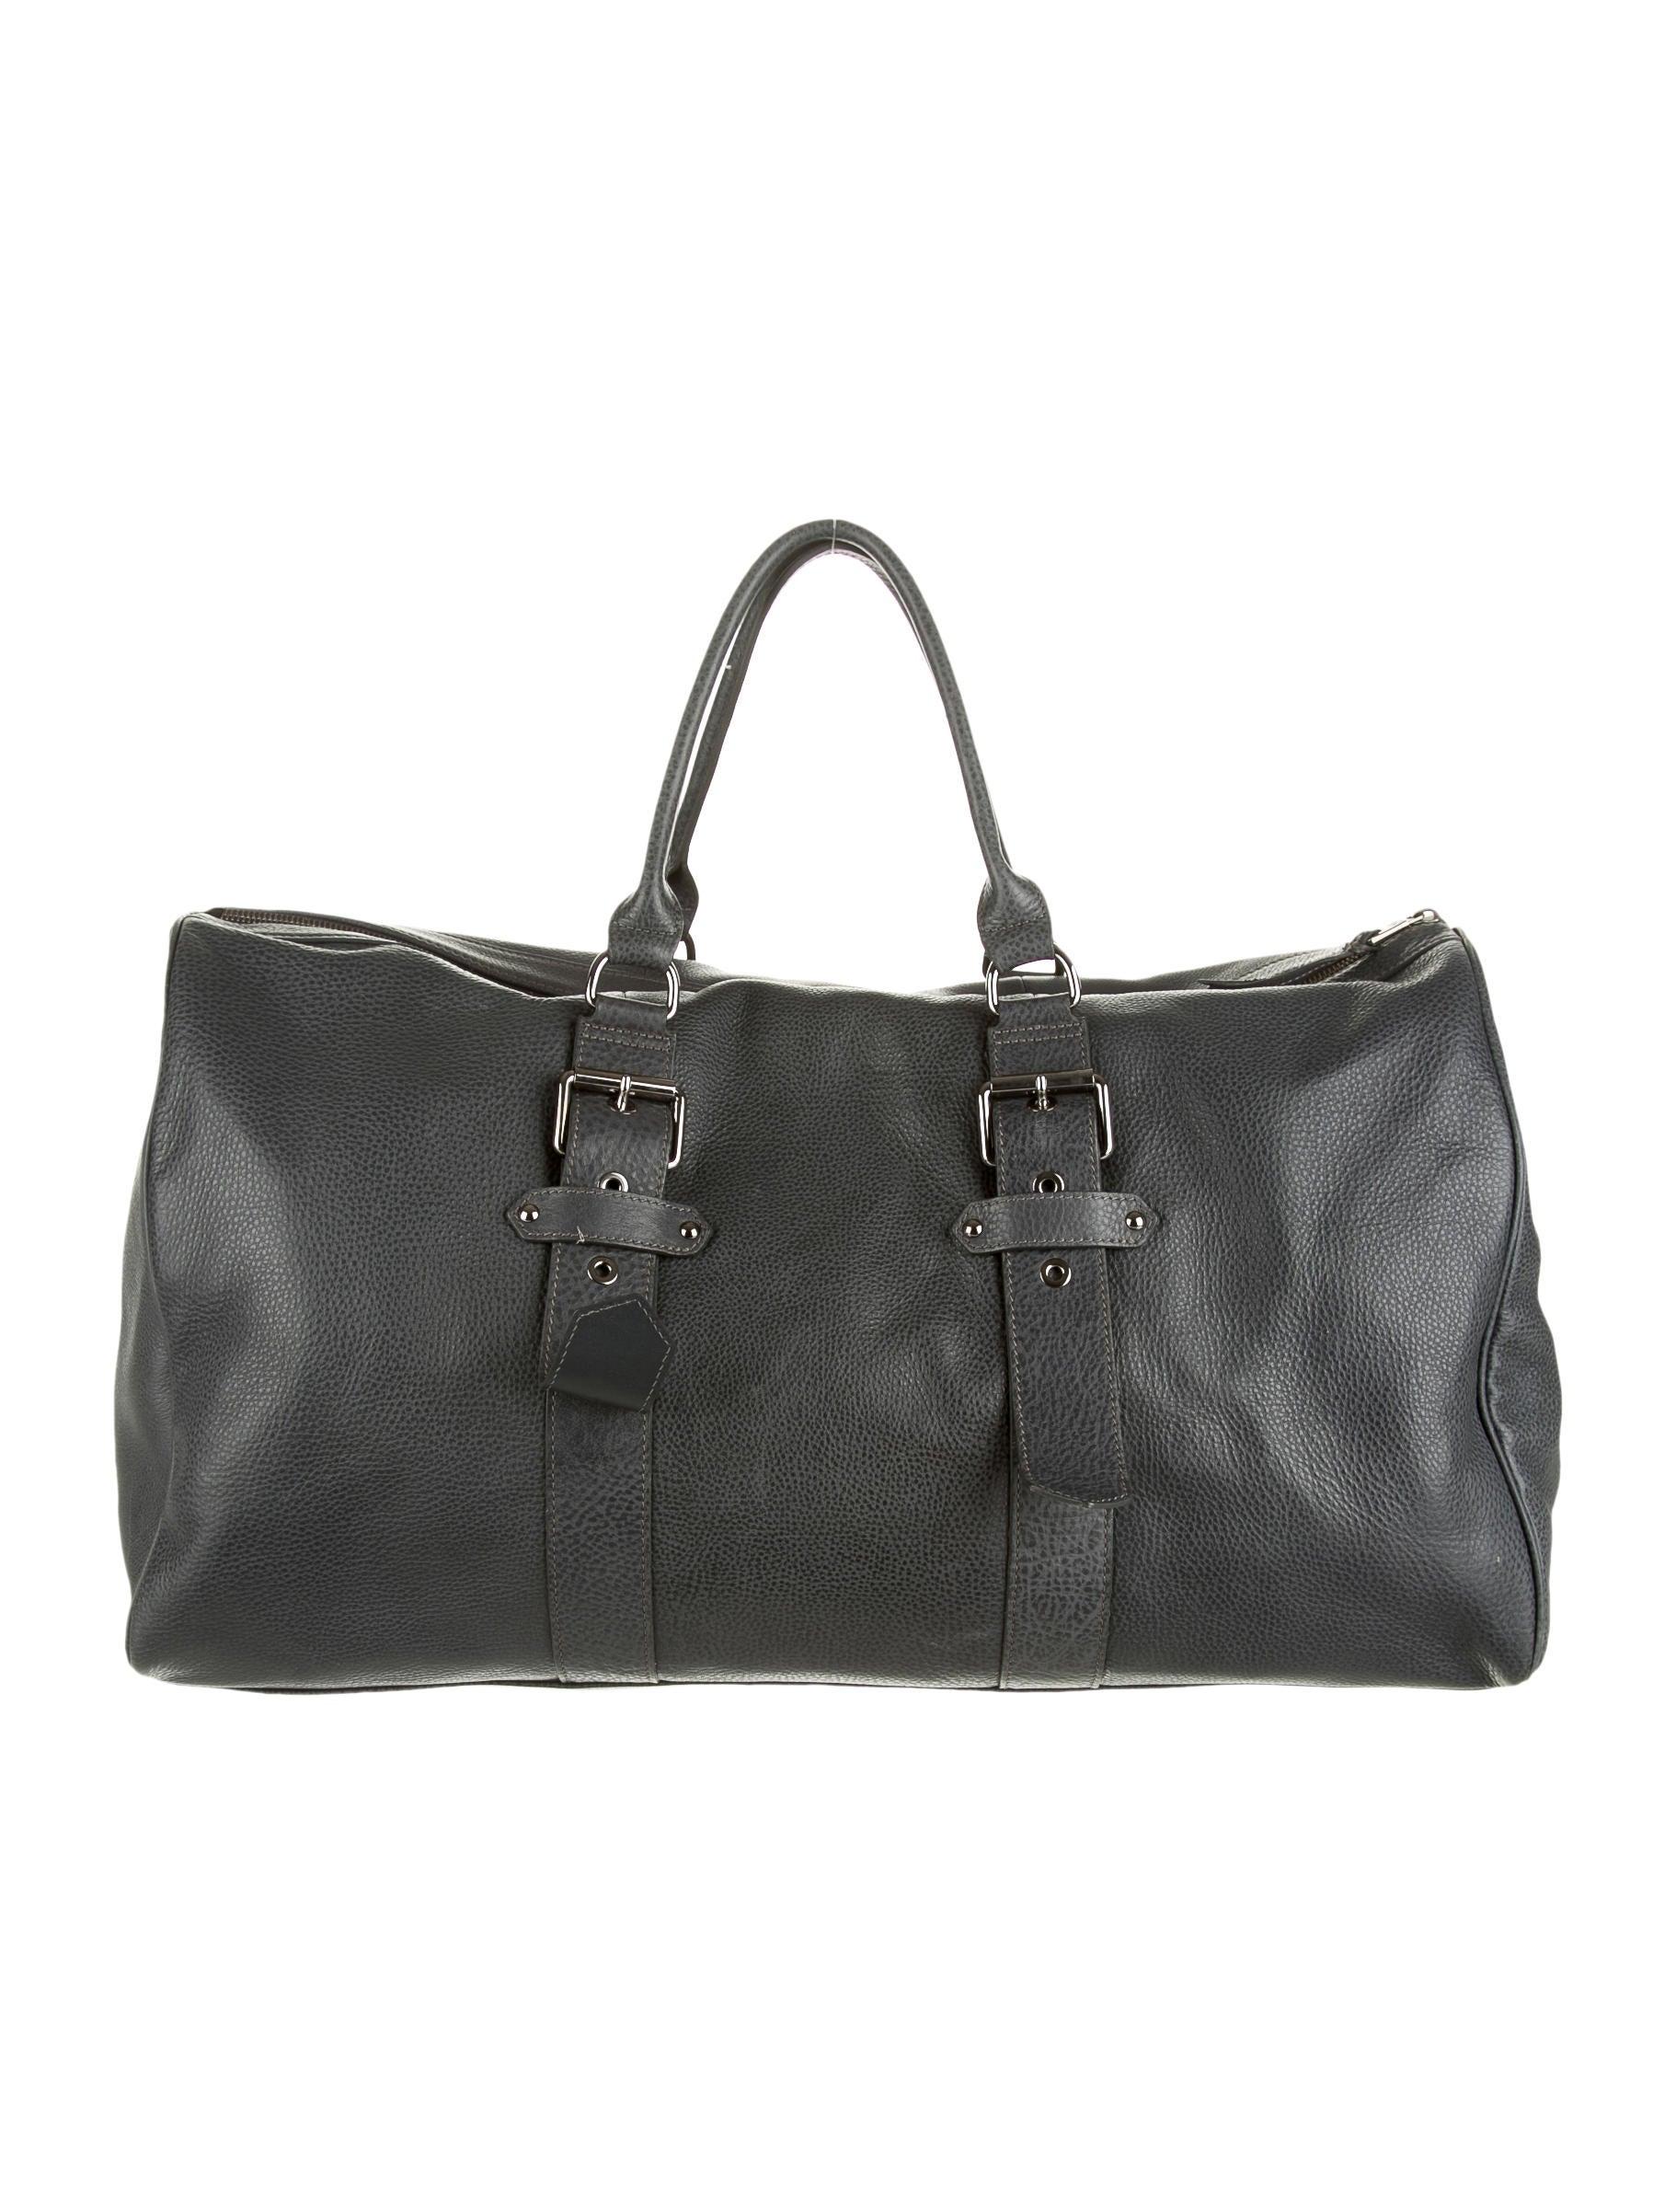 Kate Moss x Longchamp Gloucester Weekender Bag